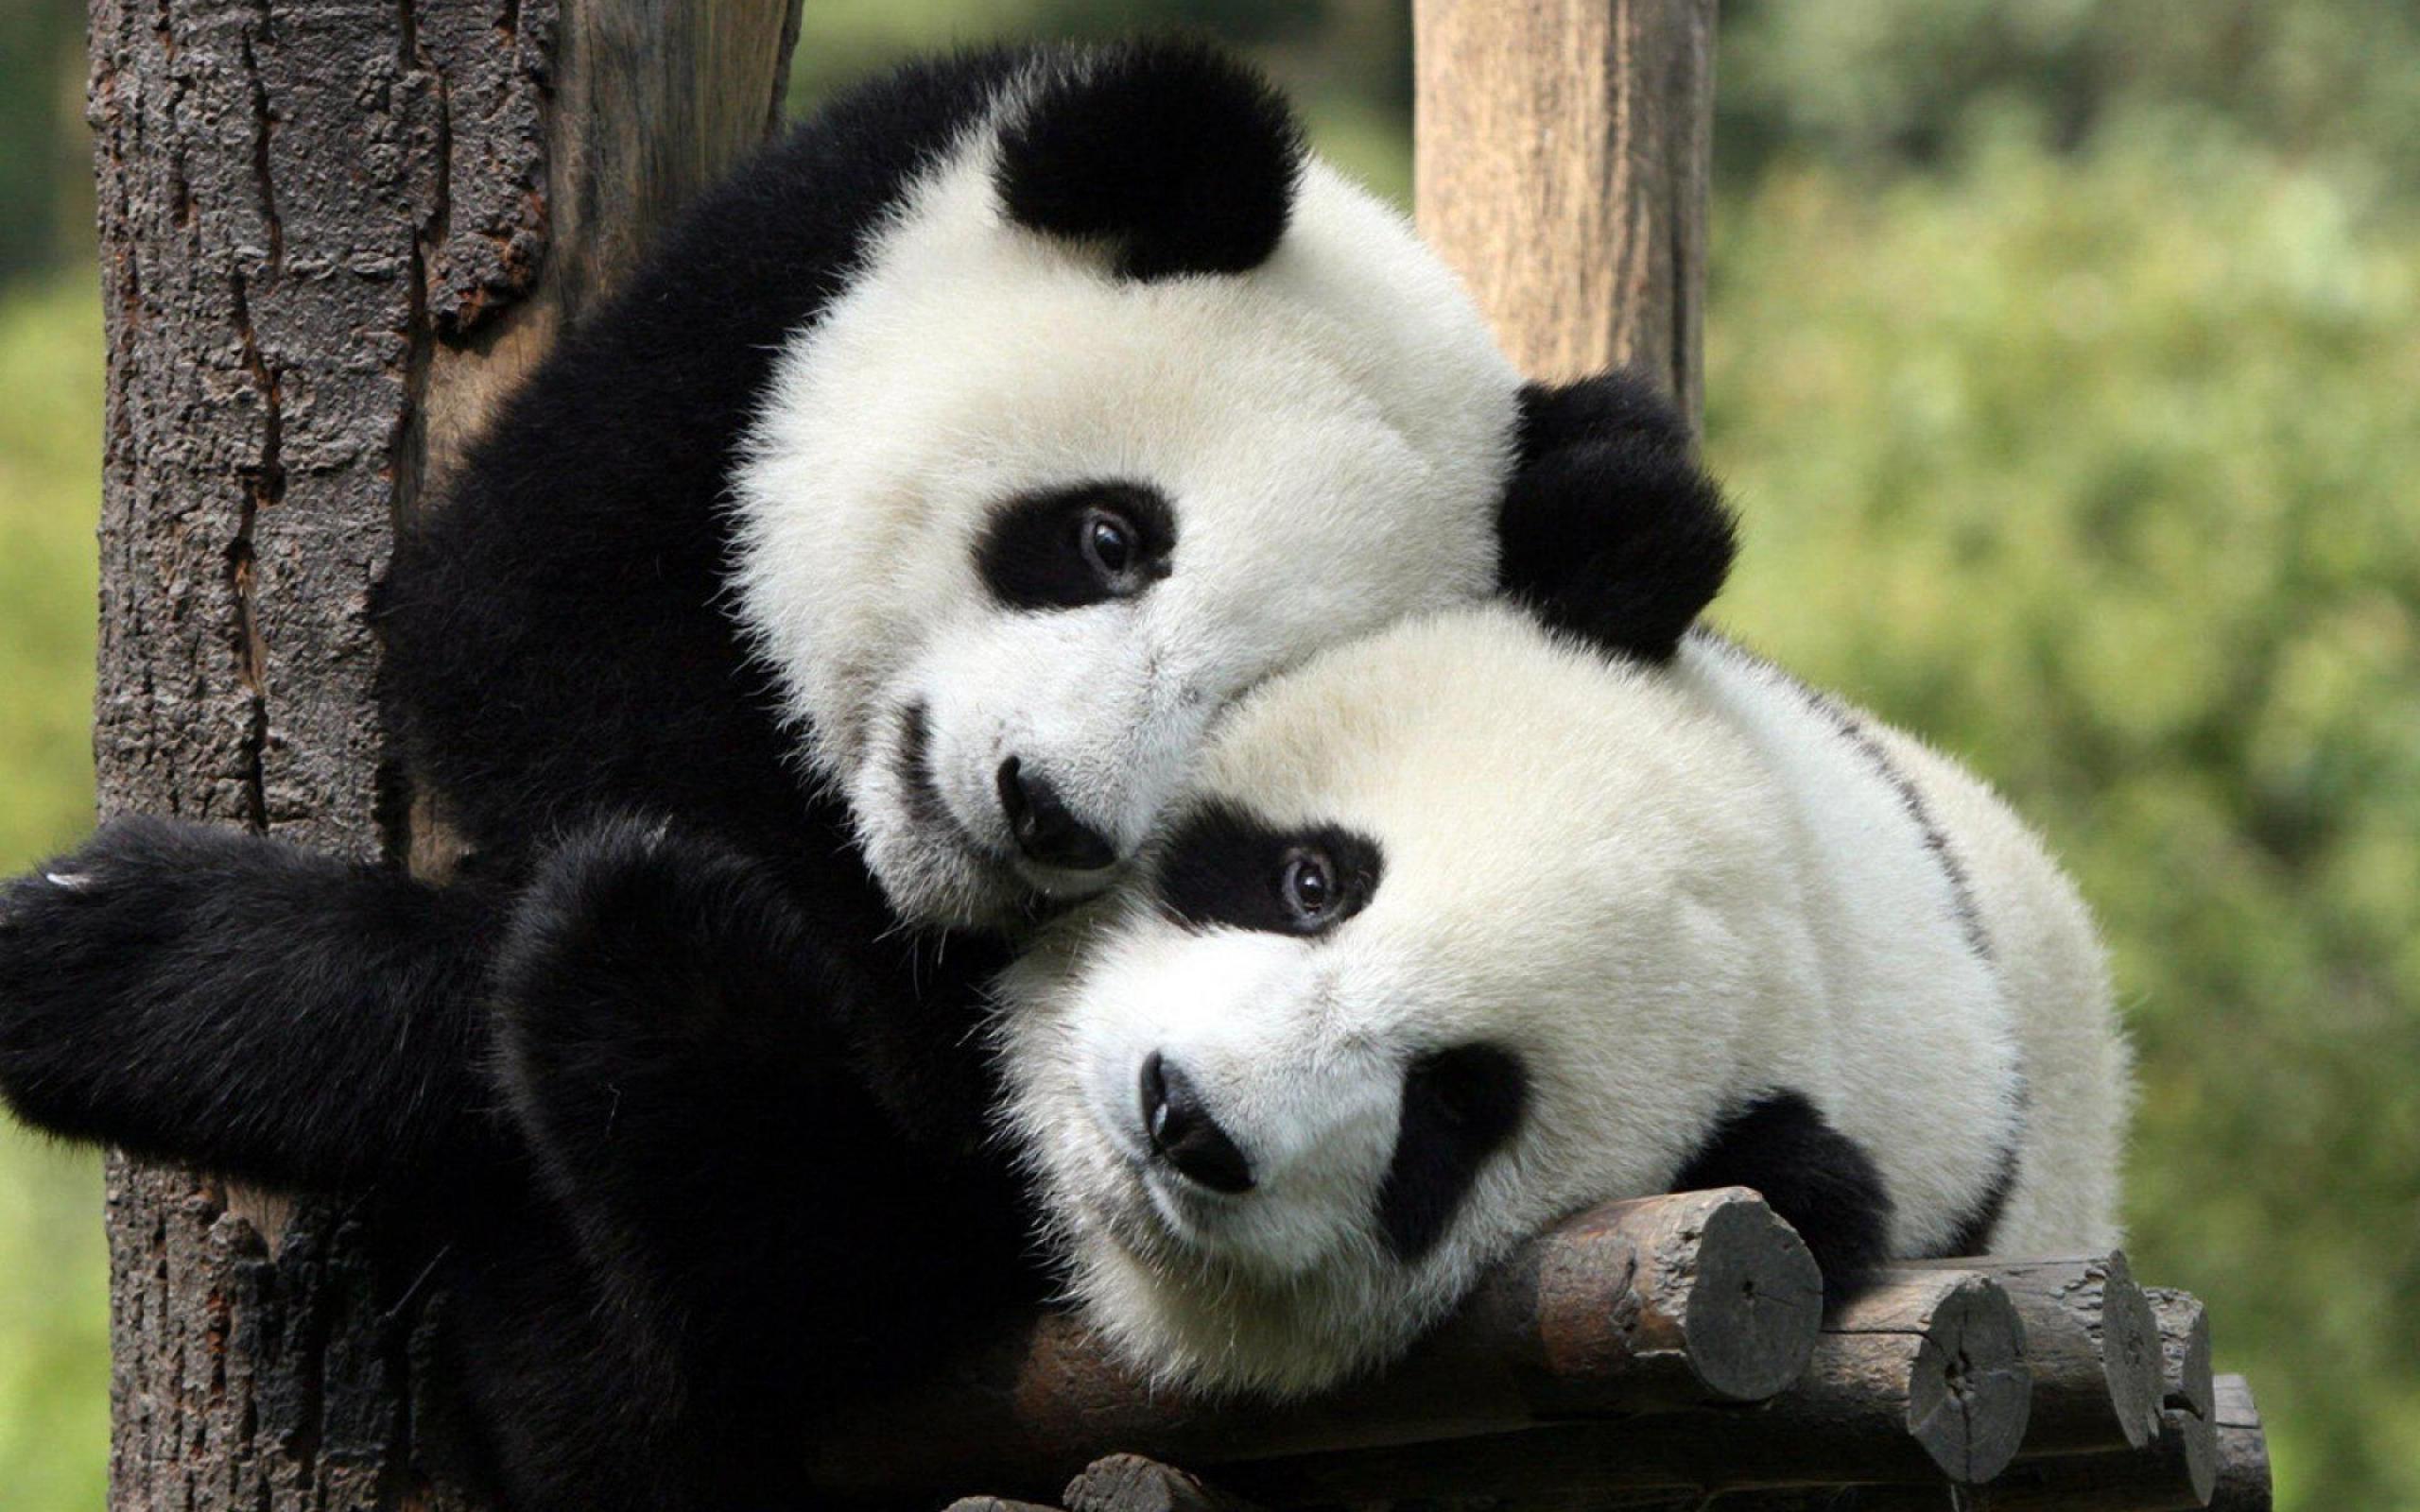 Cute Baby Girl Wallpaper Full Hd Panda Bear Background 44 Images